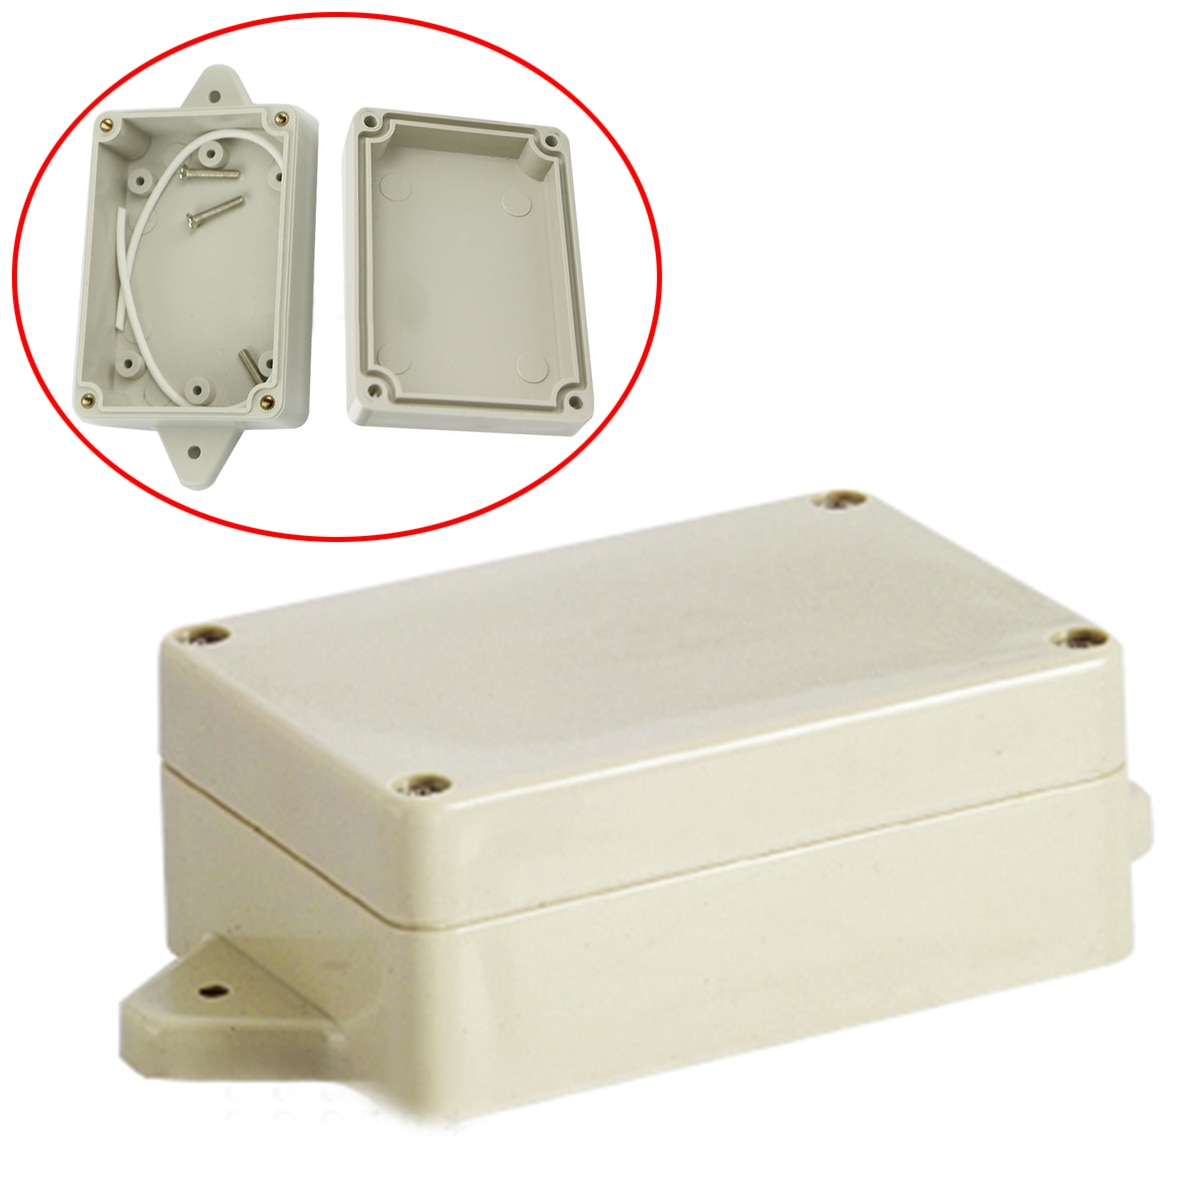 1 шт. водонепроницаемый корпус пластиковый электронный проект крышка коробка 85x58x33 мм Mayitr для блока питания